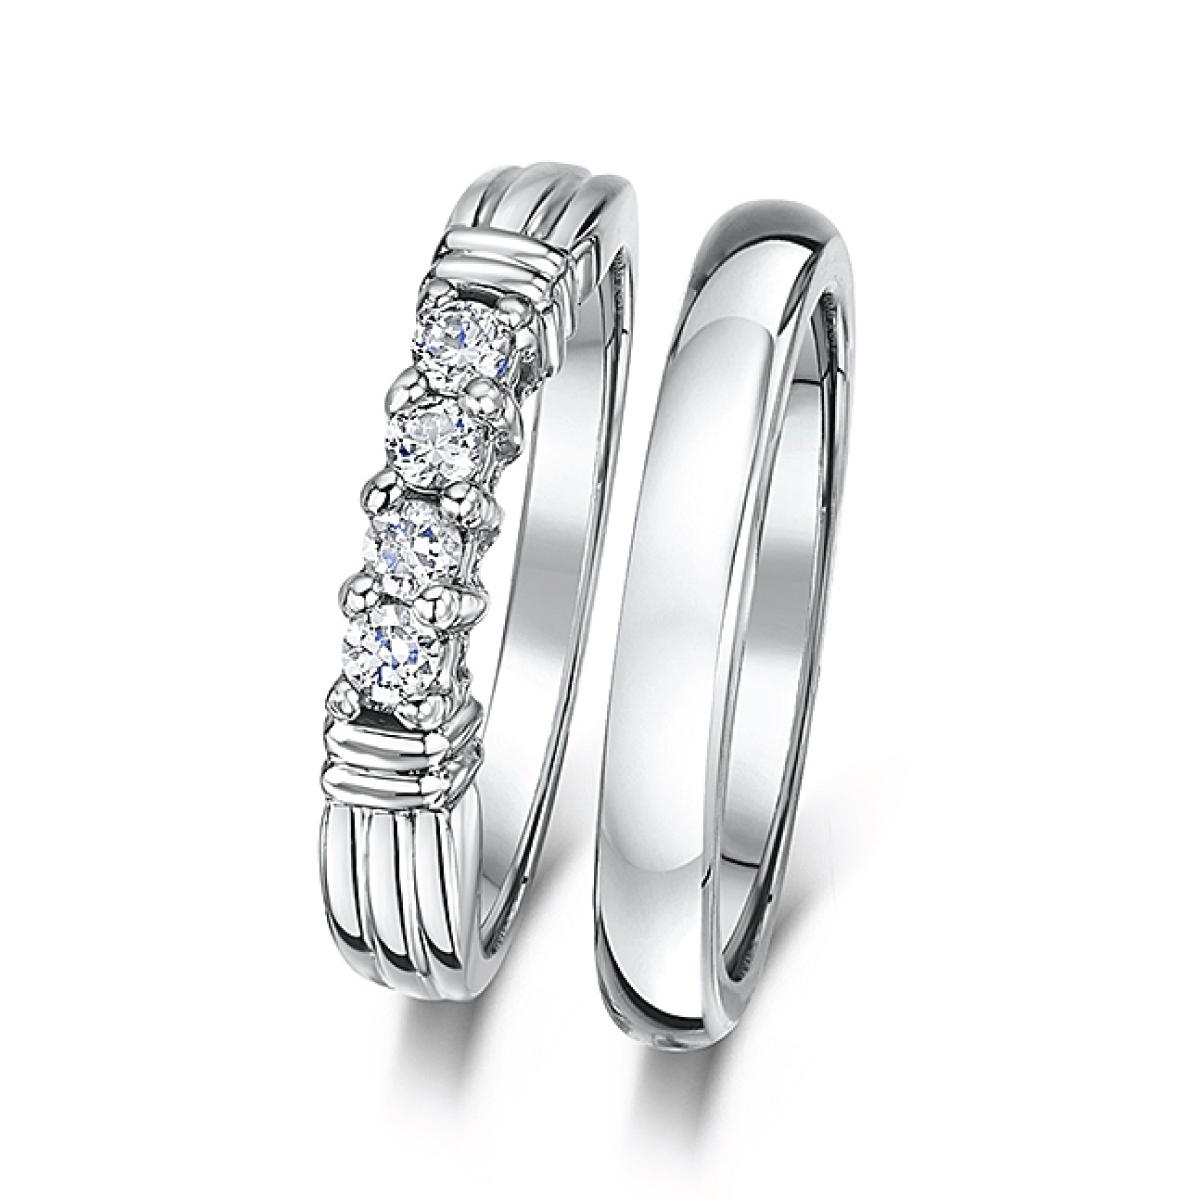 Cobalt 3mm Engagement Eternity Amp Wedding Band Bridal Set Rings Bridal Ring Sets At Elma Uk